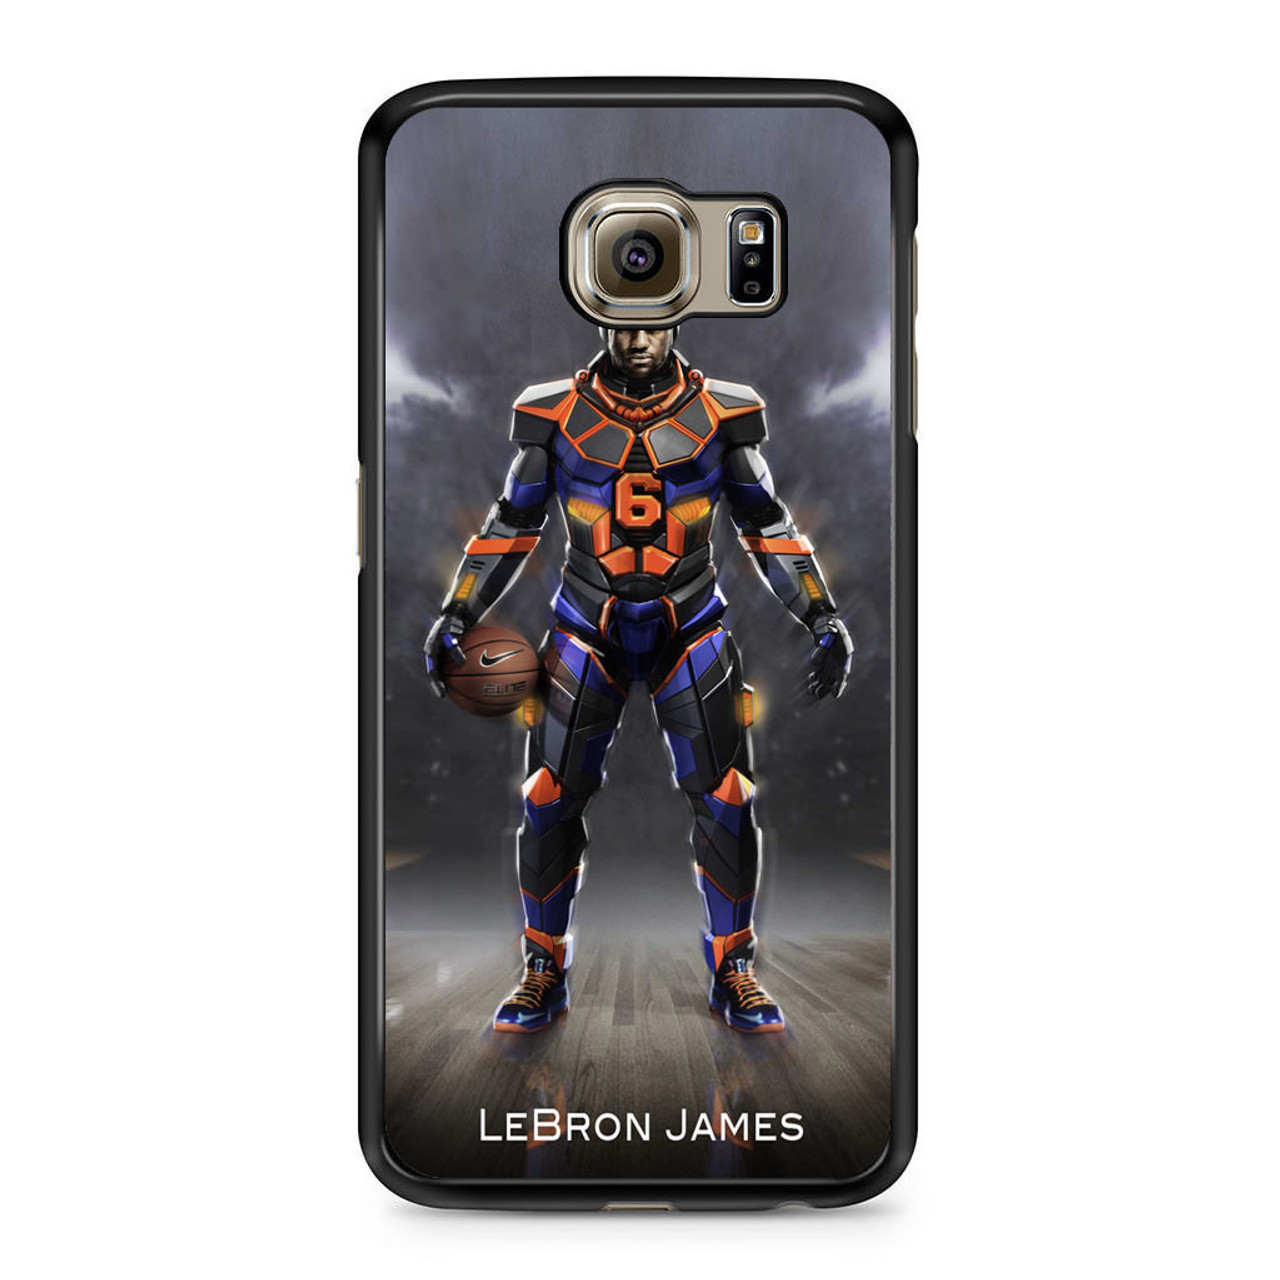 big sale 0fd70 38fa0 Lebron James Nike Samsung Galaxy S6 Case